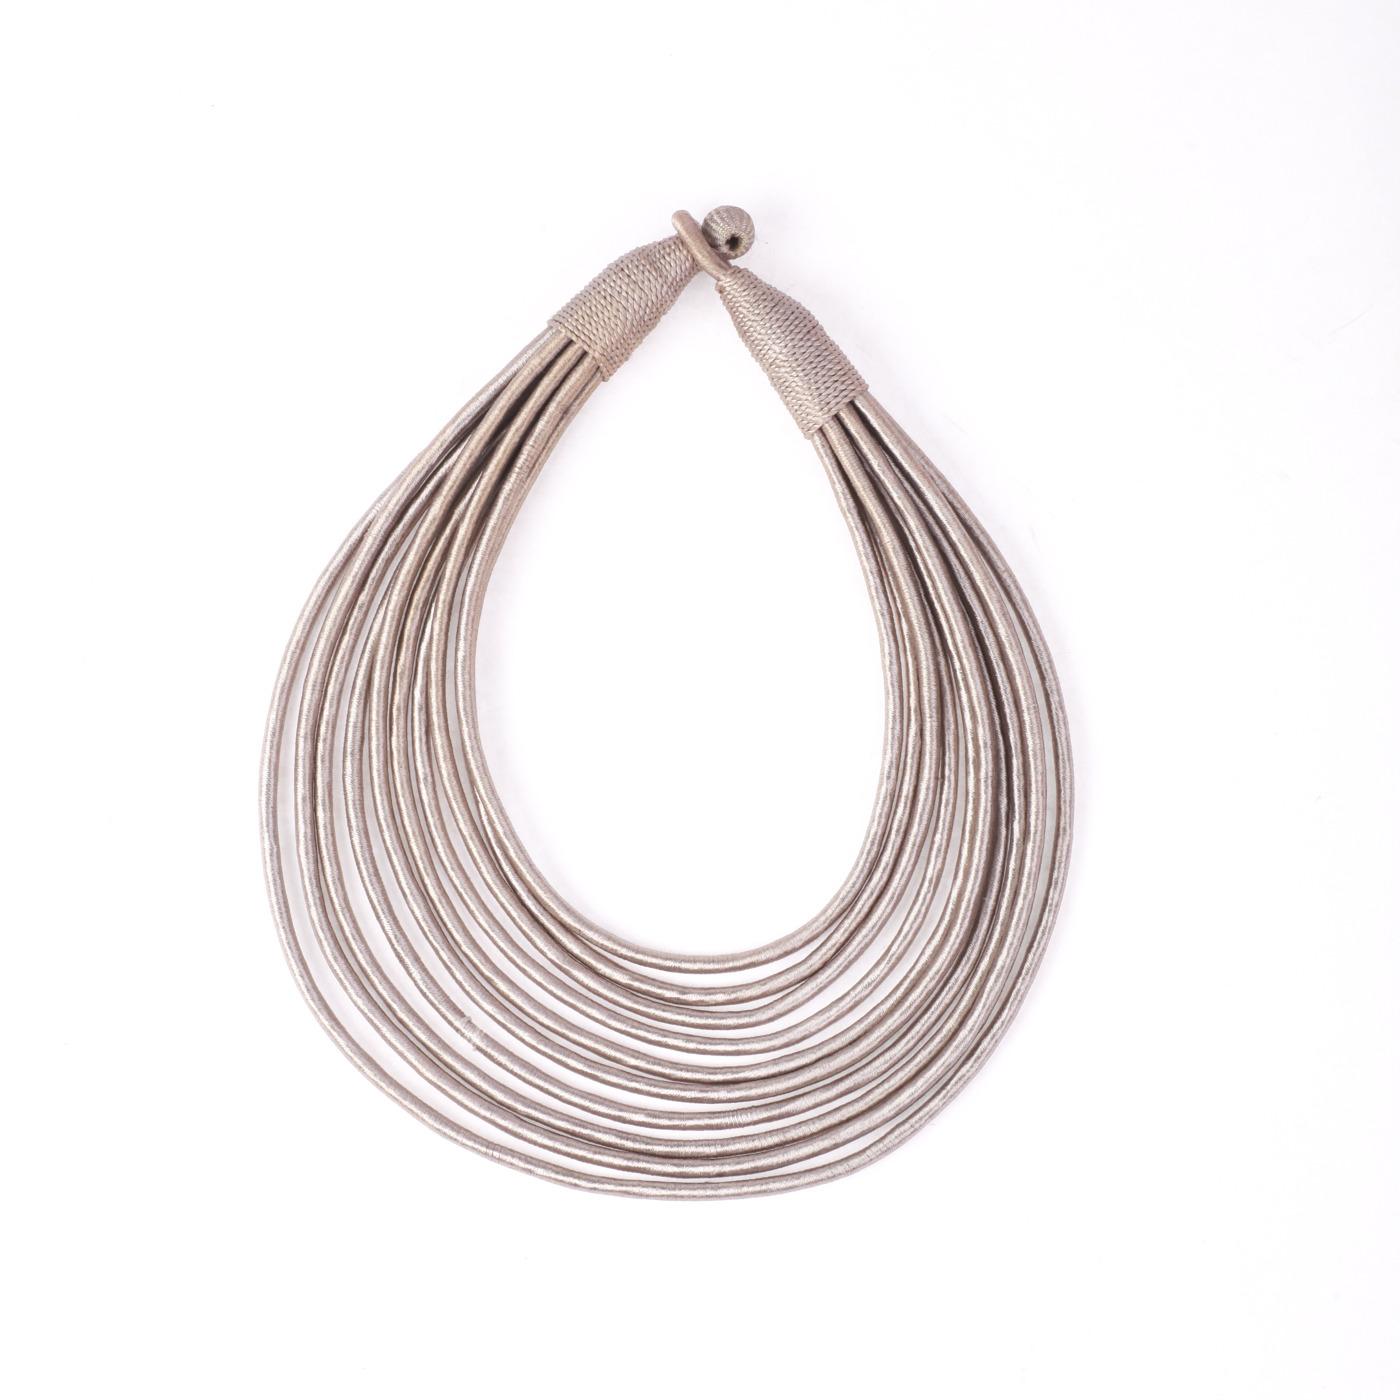 Artisan, Eco-Friendly, Designer Saturn's Return Necklace